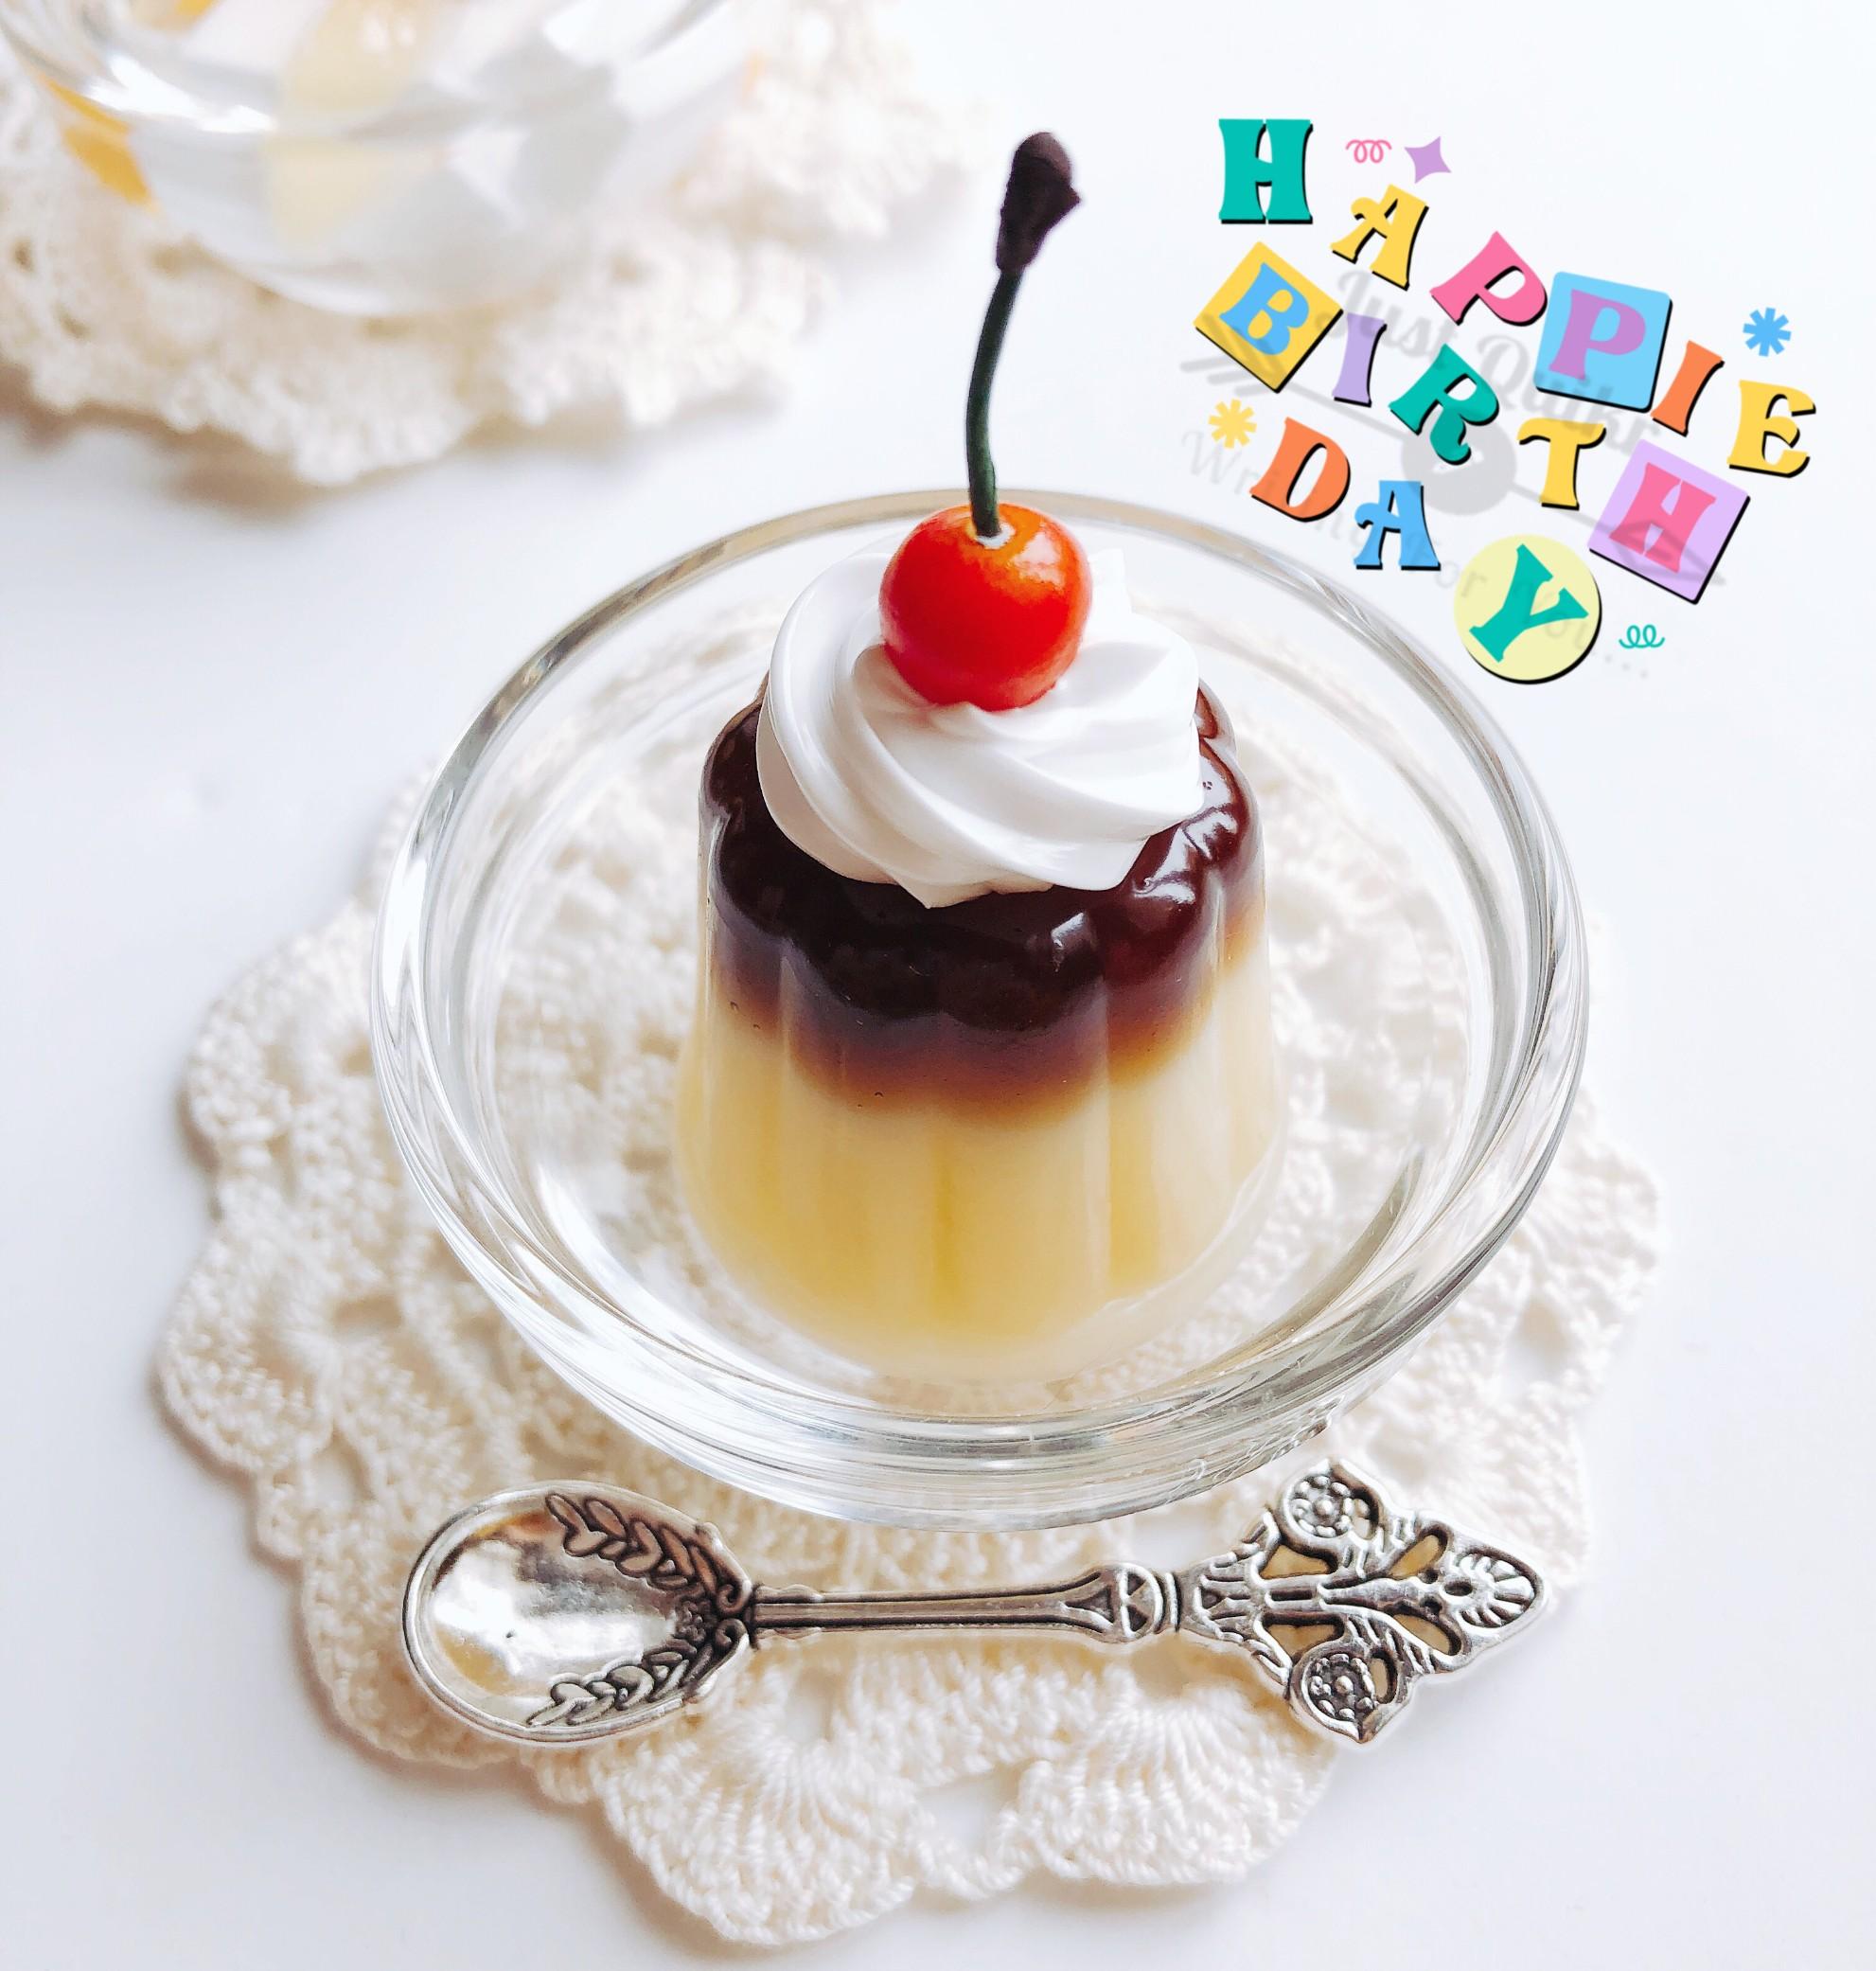 Creative Happy Birthday Wishing Cake Status Images for Granddaughter